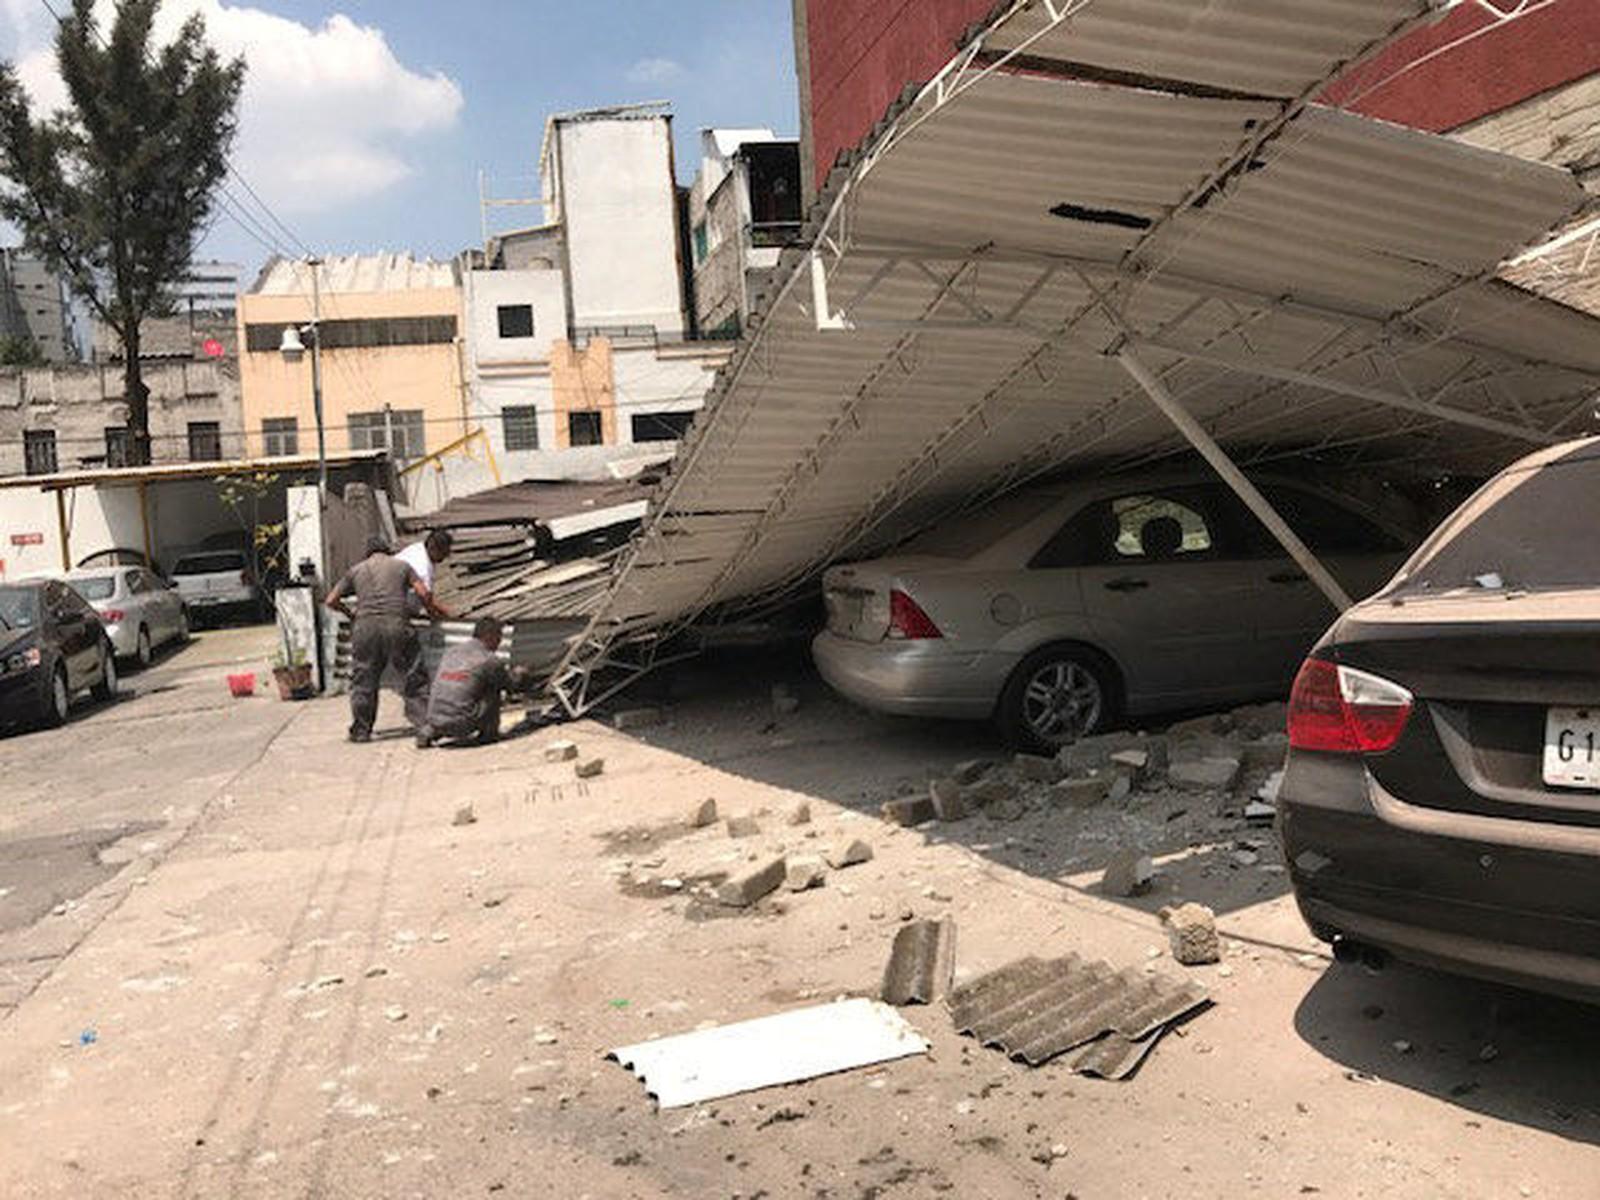 [Imagem: 2017-09-19t192124z-1515707922-rc1d47dfd4...-quake.jpg]